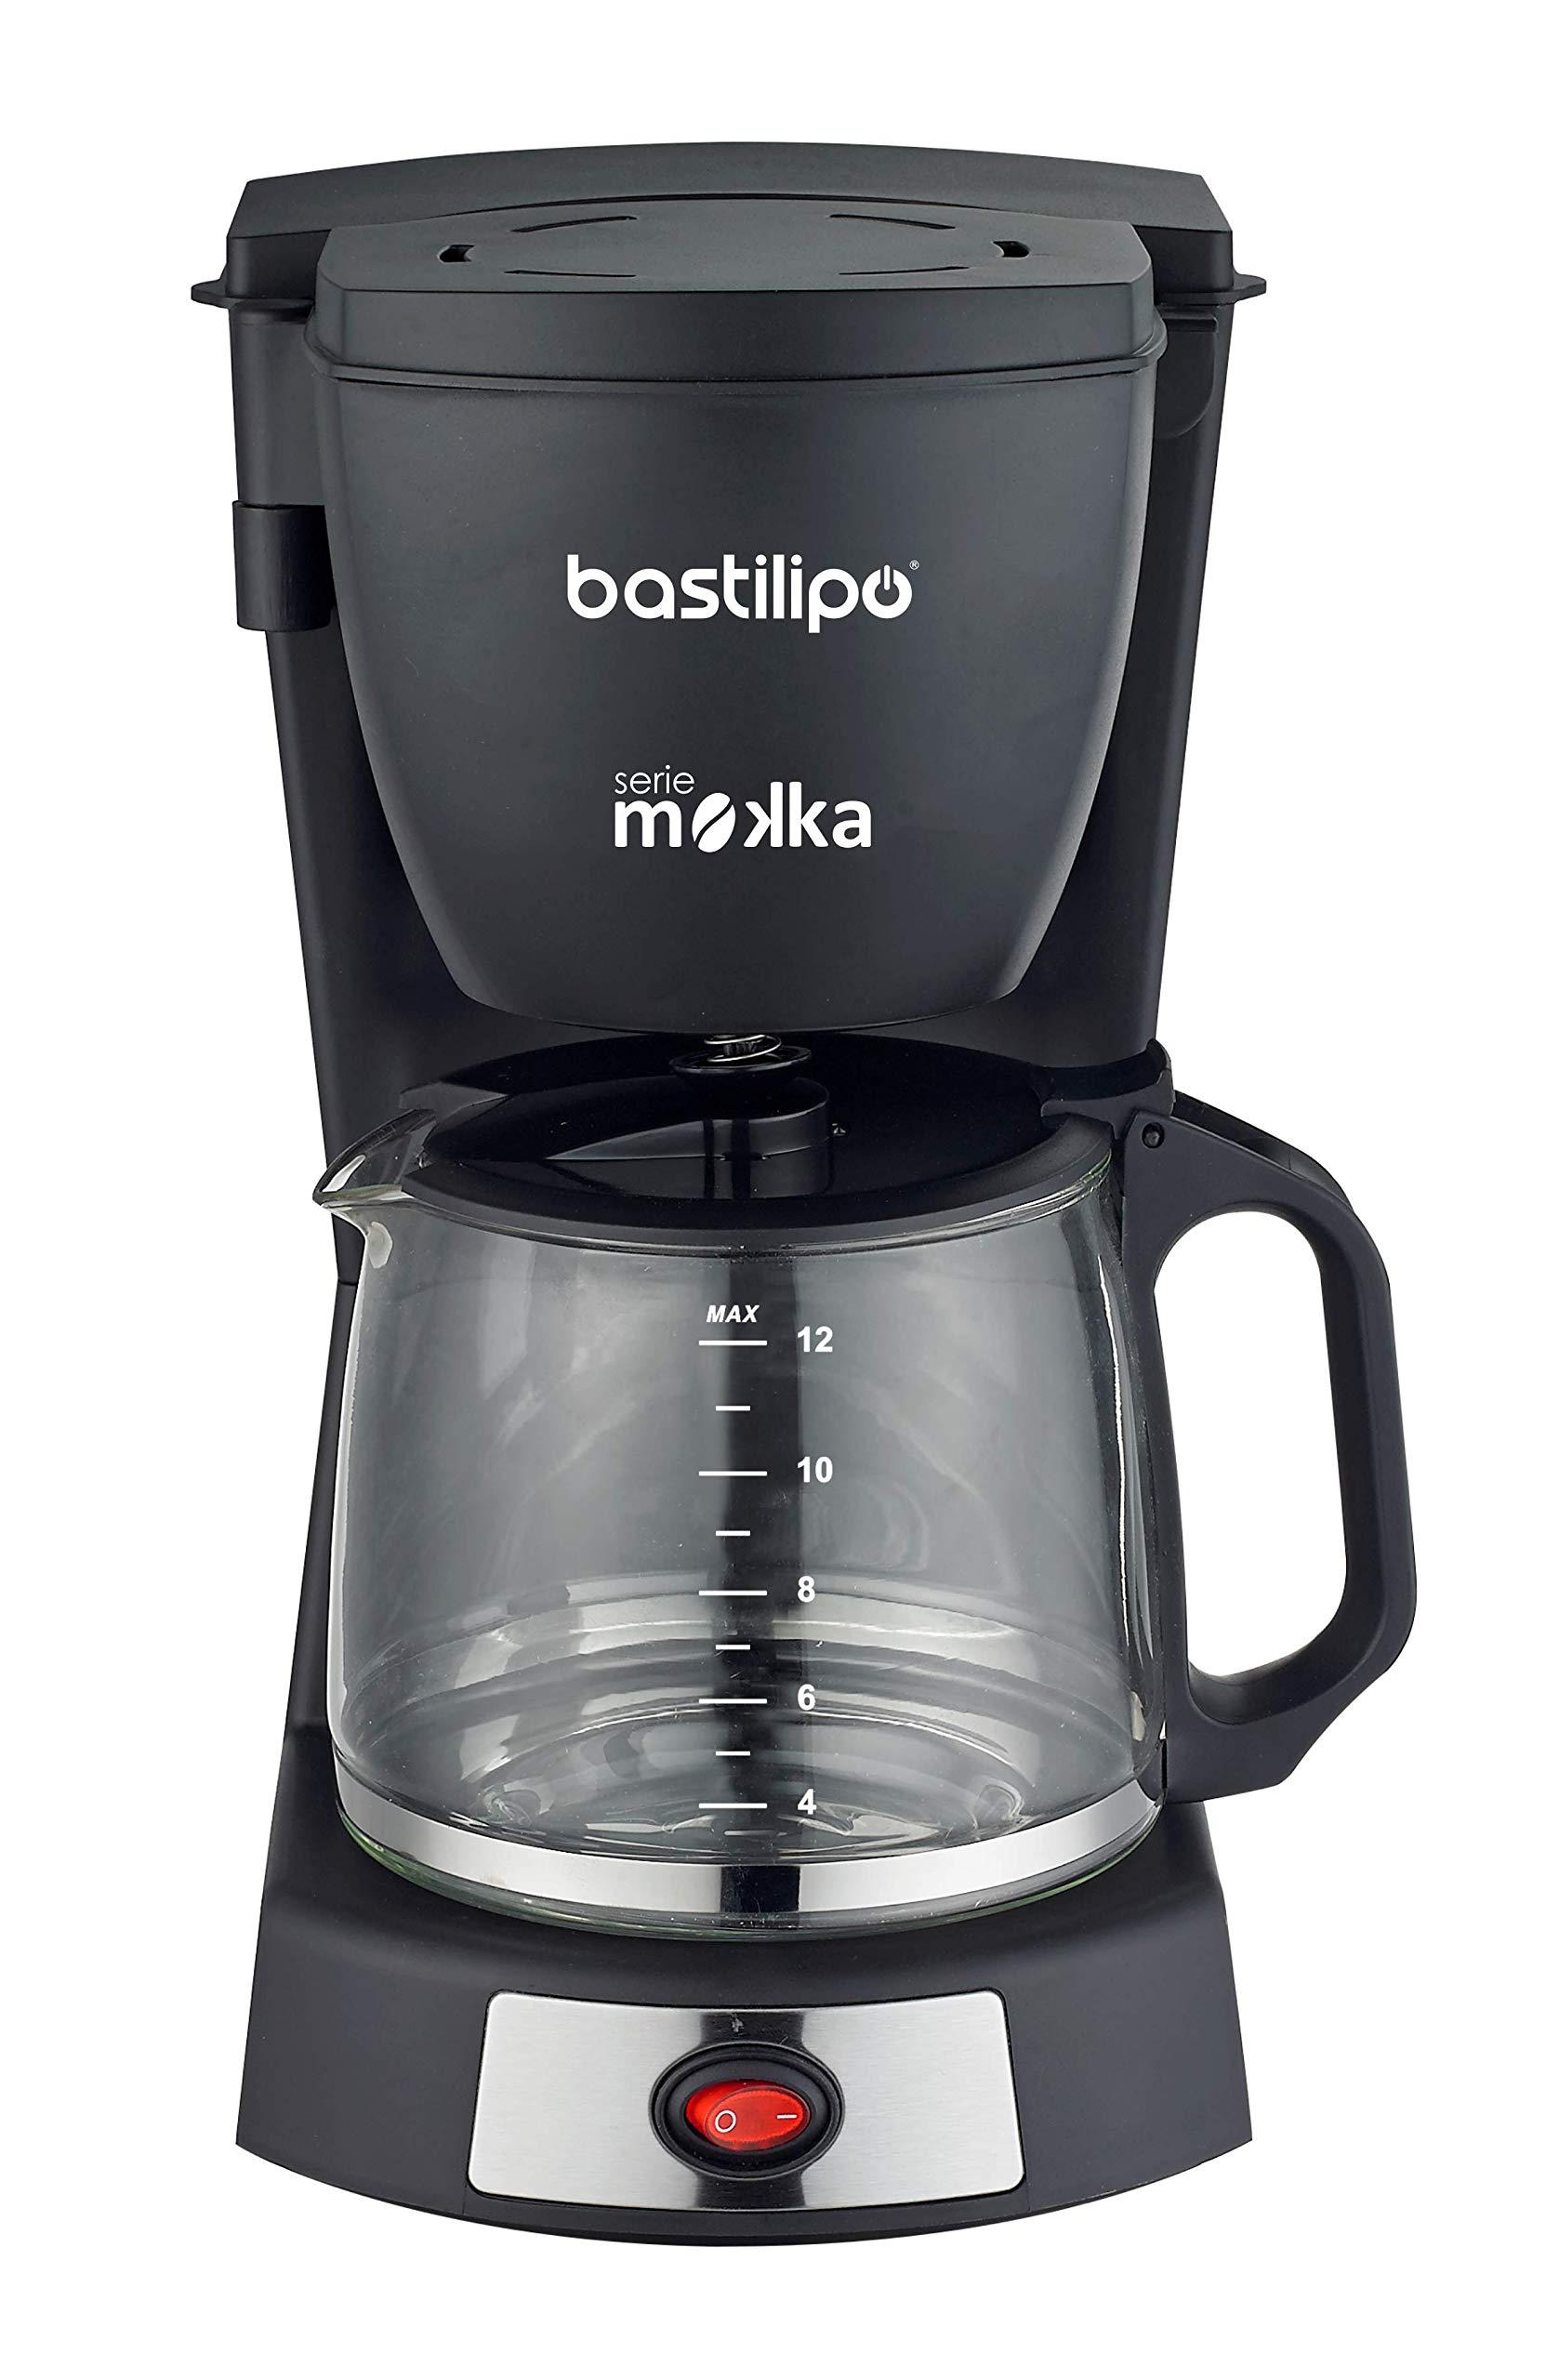 Bastilipo 6879 Cafetera Goteo, 680 W, 14 Cups, Acero Inoxidable, Negro/Plata: Amazon.es: Hogar